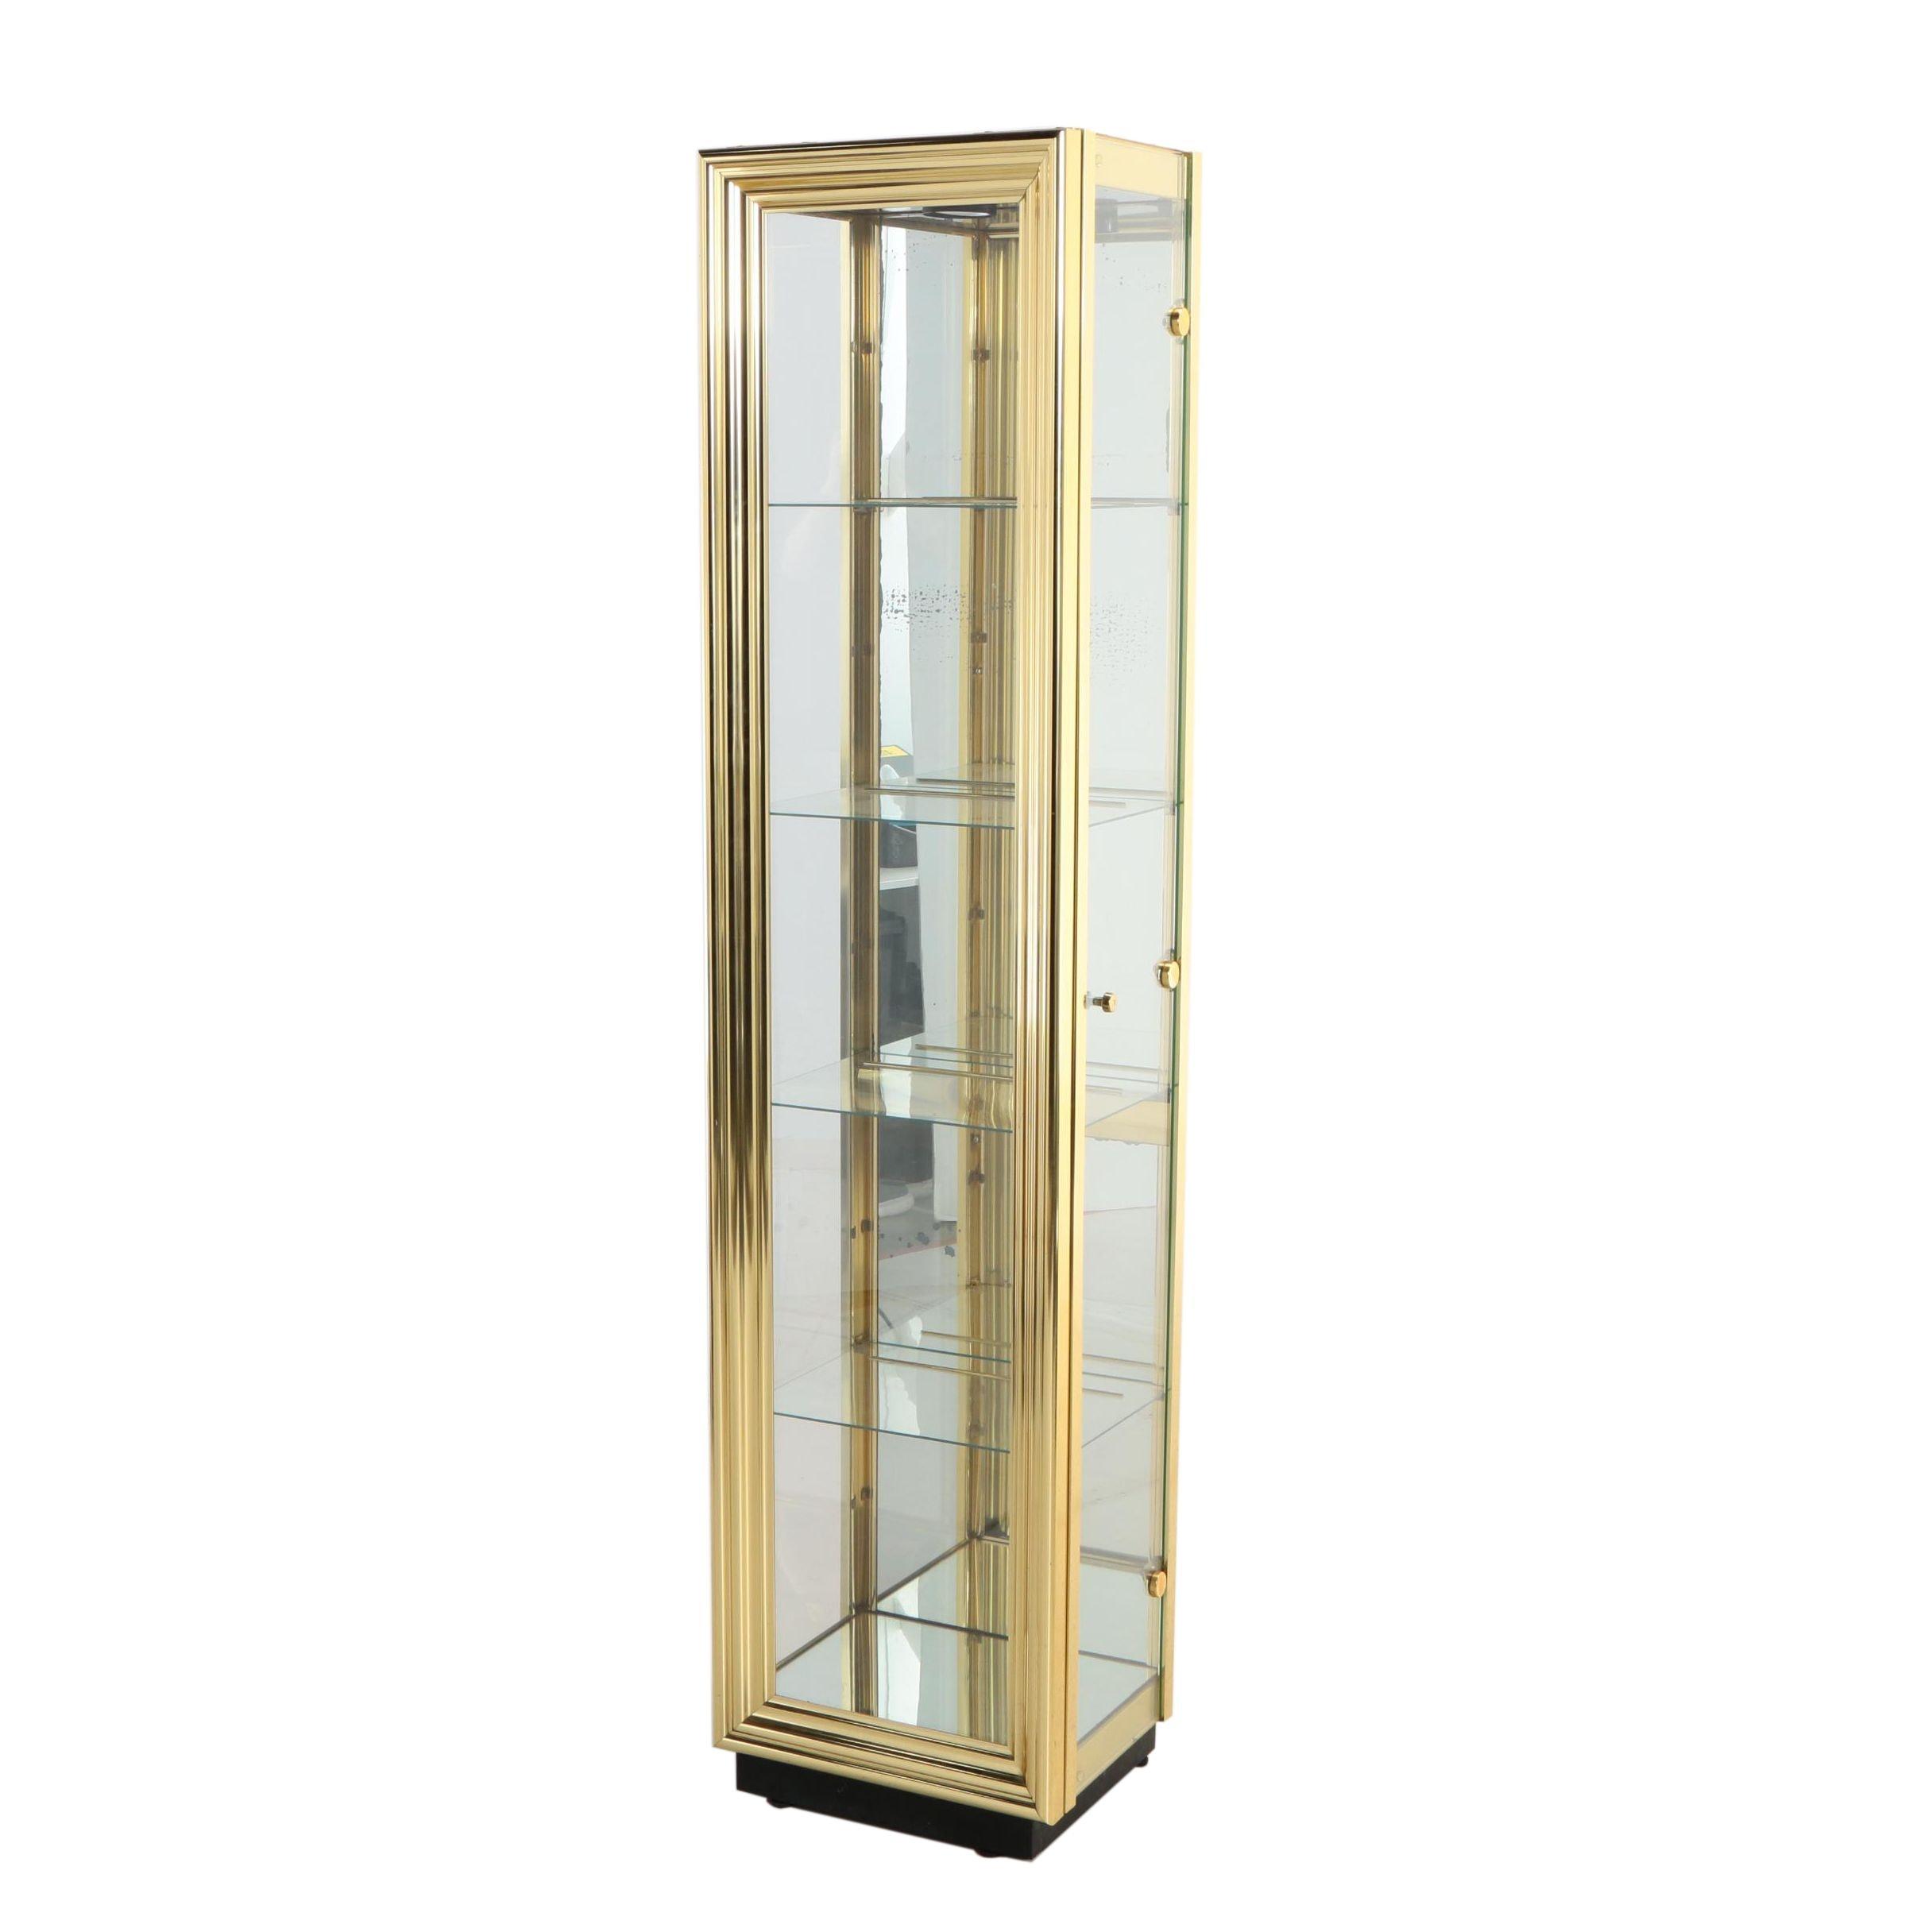 Brass Display Cabinet, Second Half 20th Century